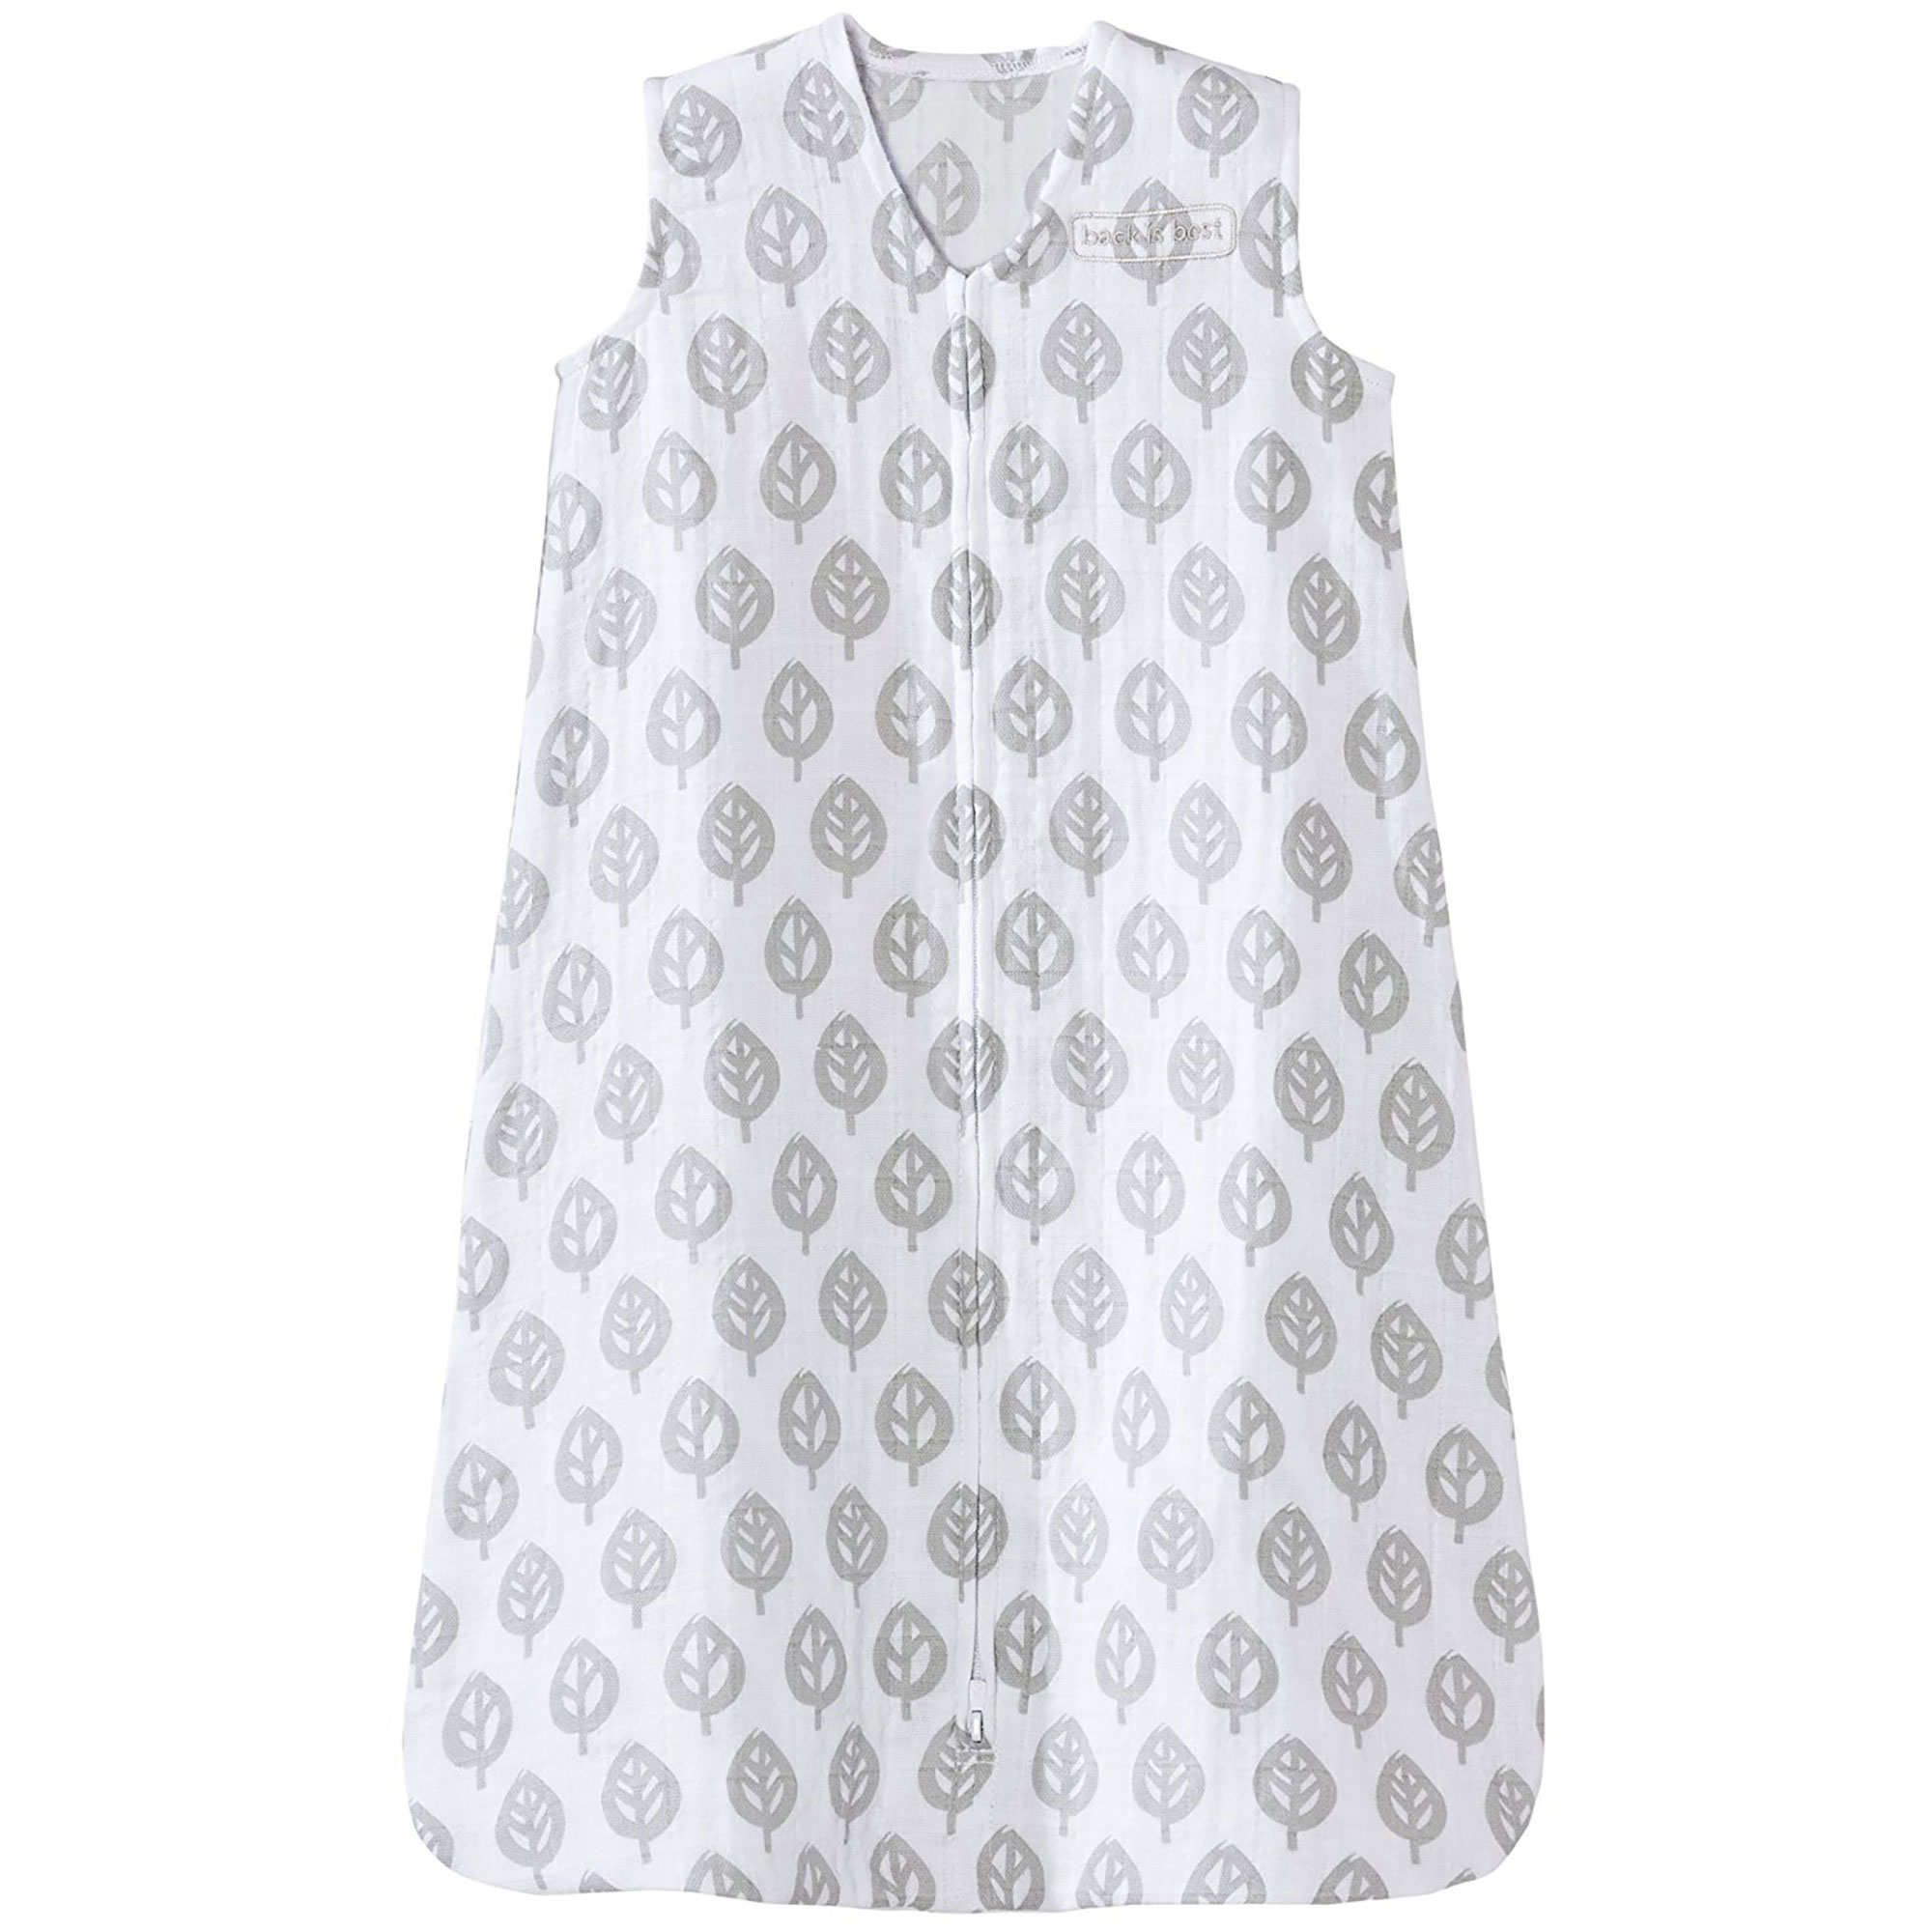 Halo 100% Cotton Muslin Baby Sleepsack Wearable Blanket, Grey Tree Leaf, Extra-Large